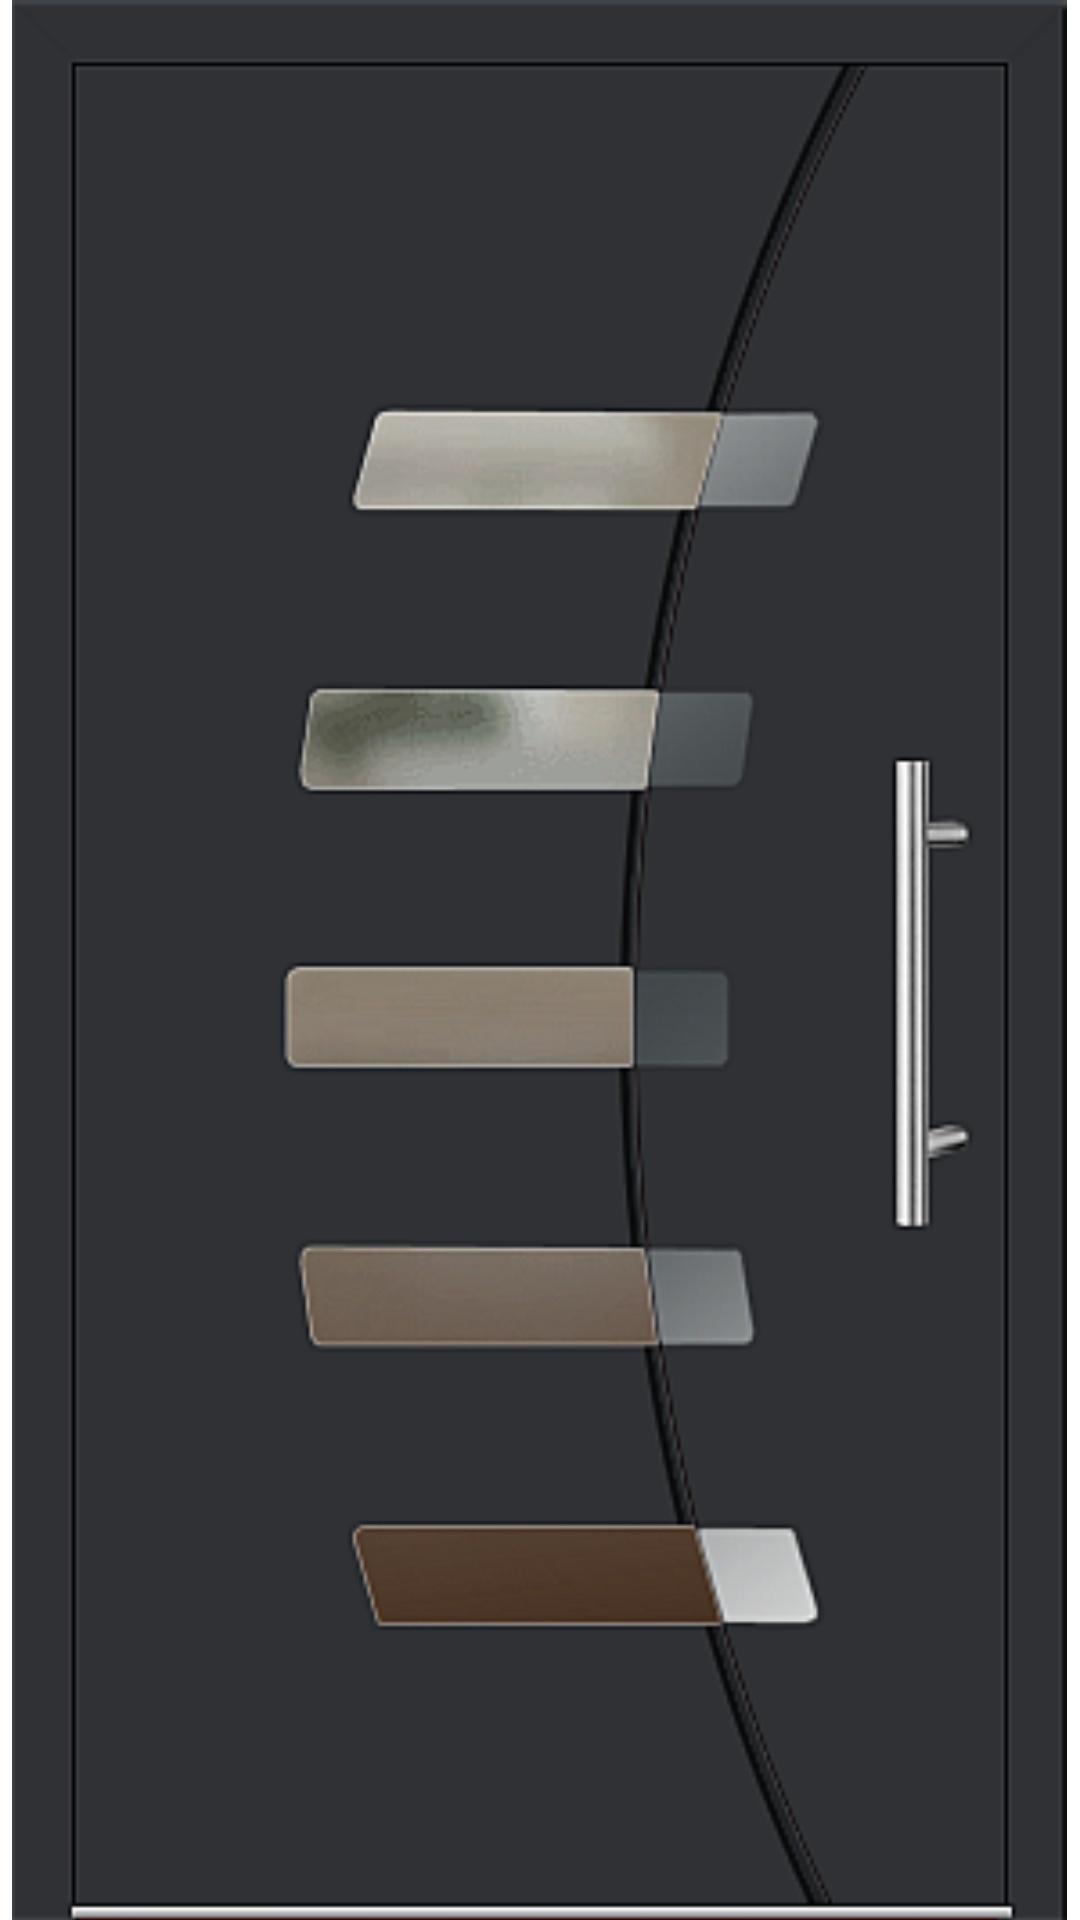 Aluminium Haustür Modell 6828-57 schwarz